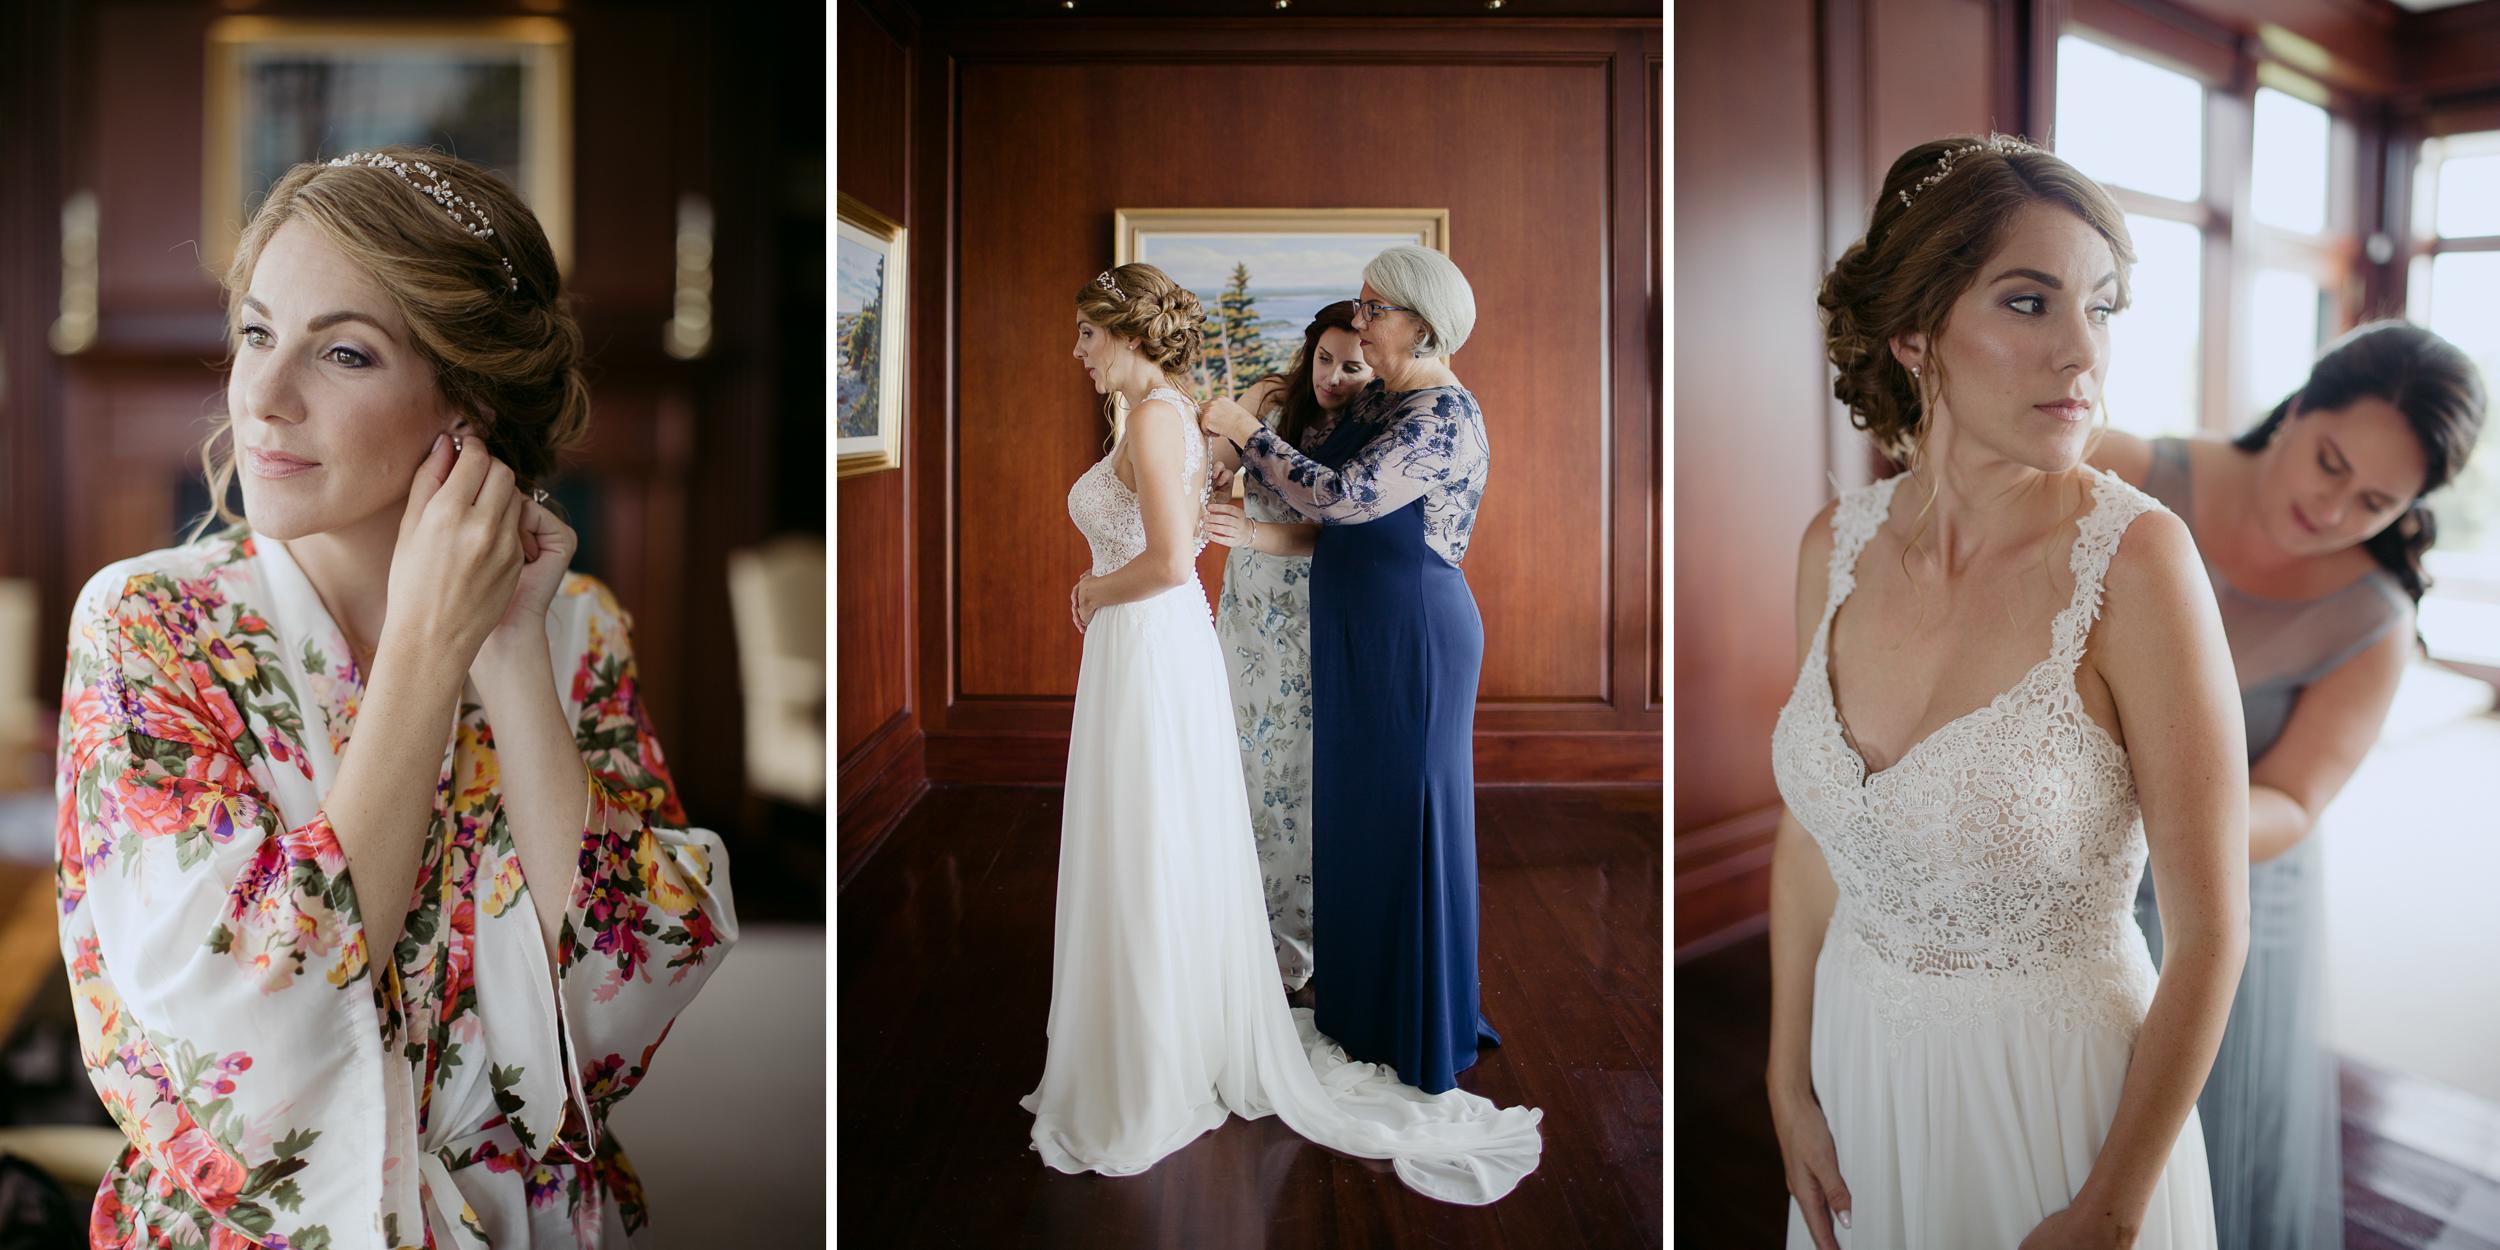 point_lookout_northport_Maine_Midcoast_wedding_leslie_justin-2.jpg